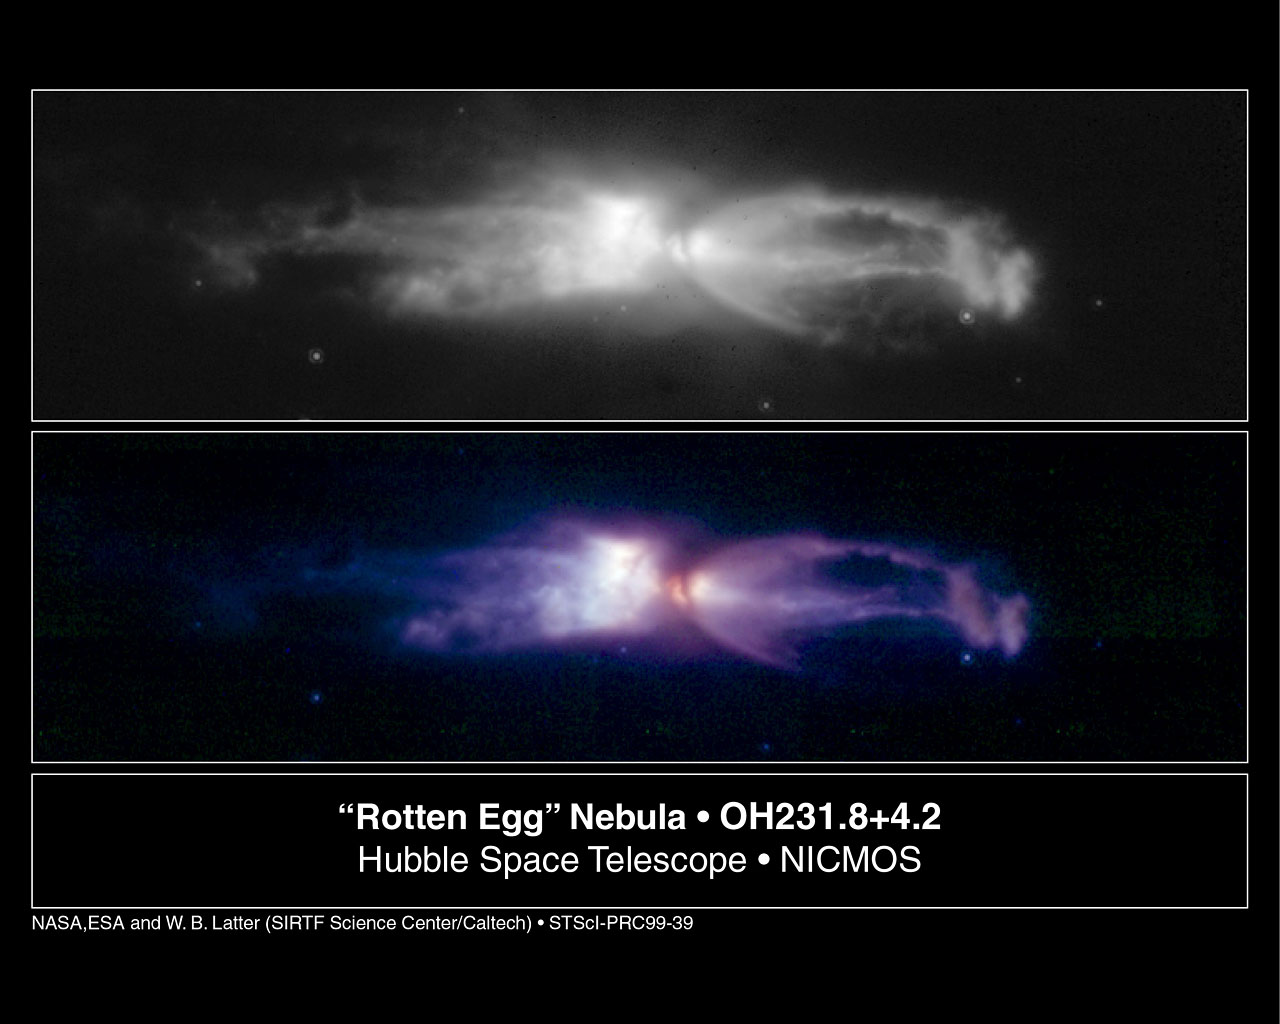 The 'Rotten Egg' Nebula - a Planetary Nebula in the Making